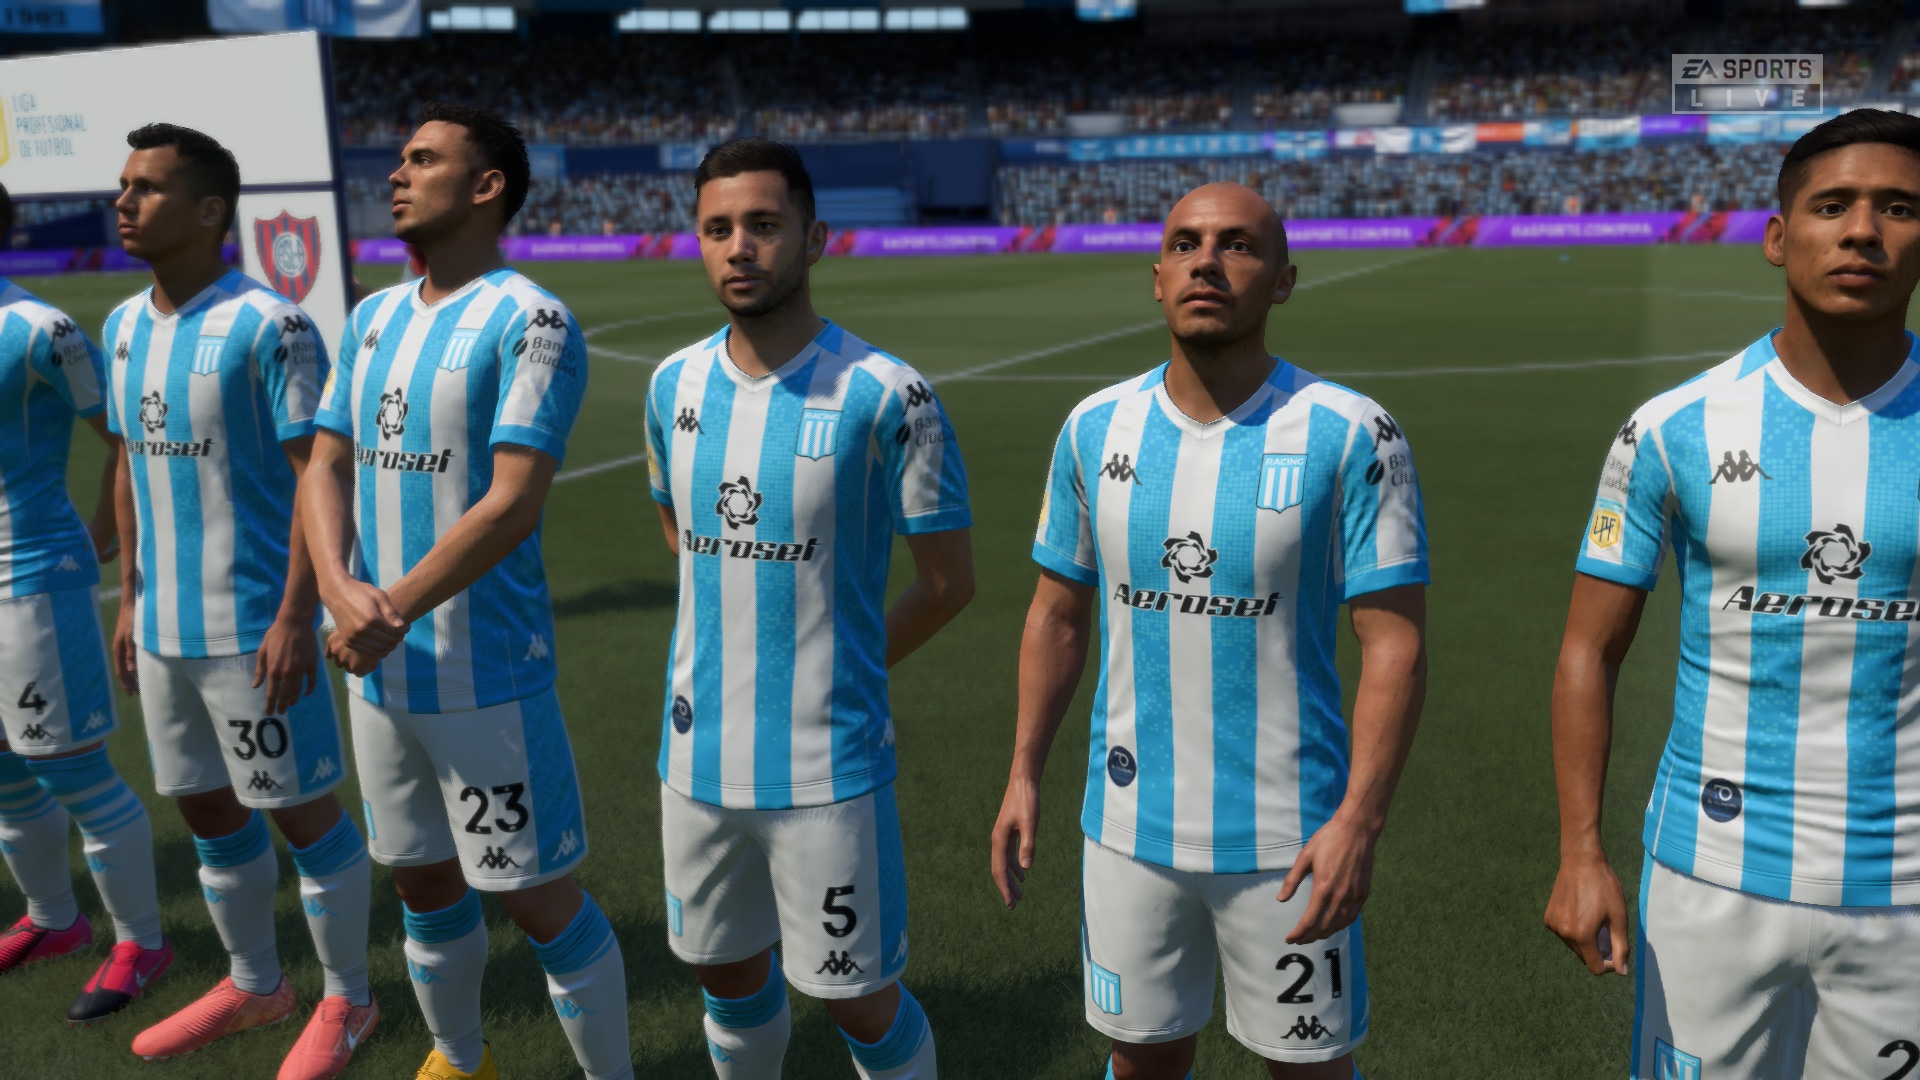 Fifa 21 Argentina Primera Divisoin free download